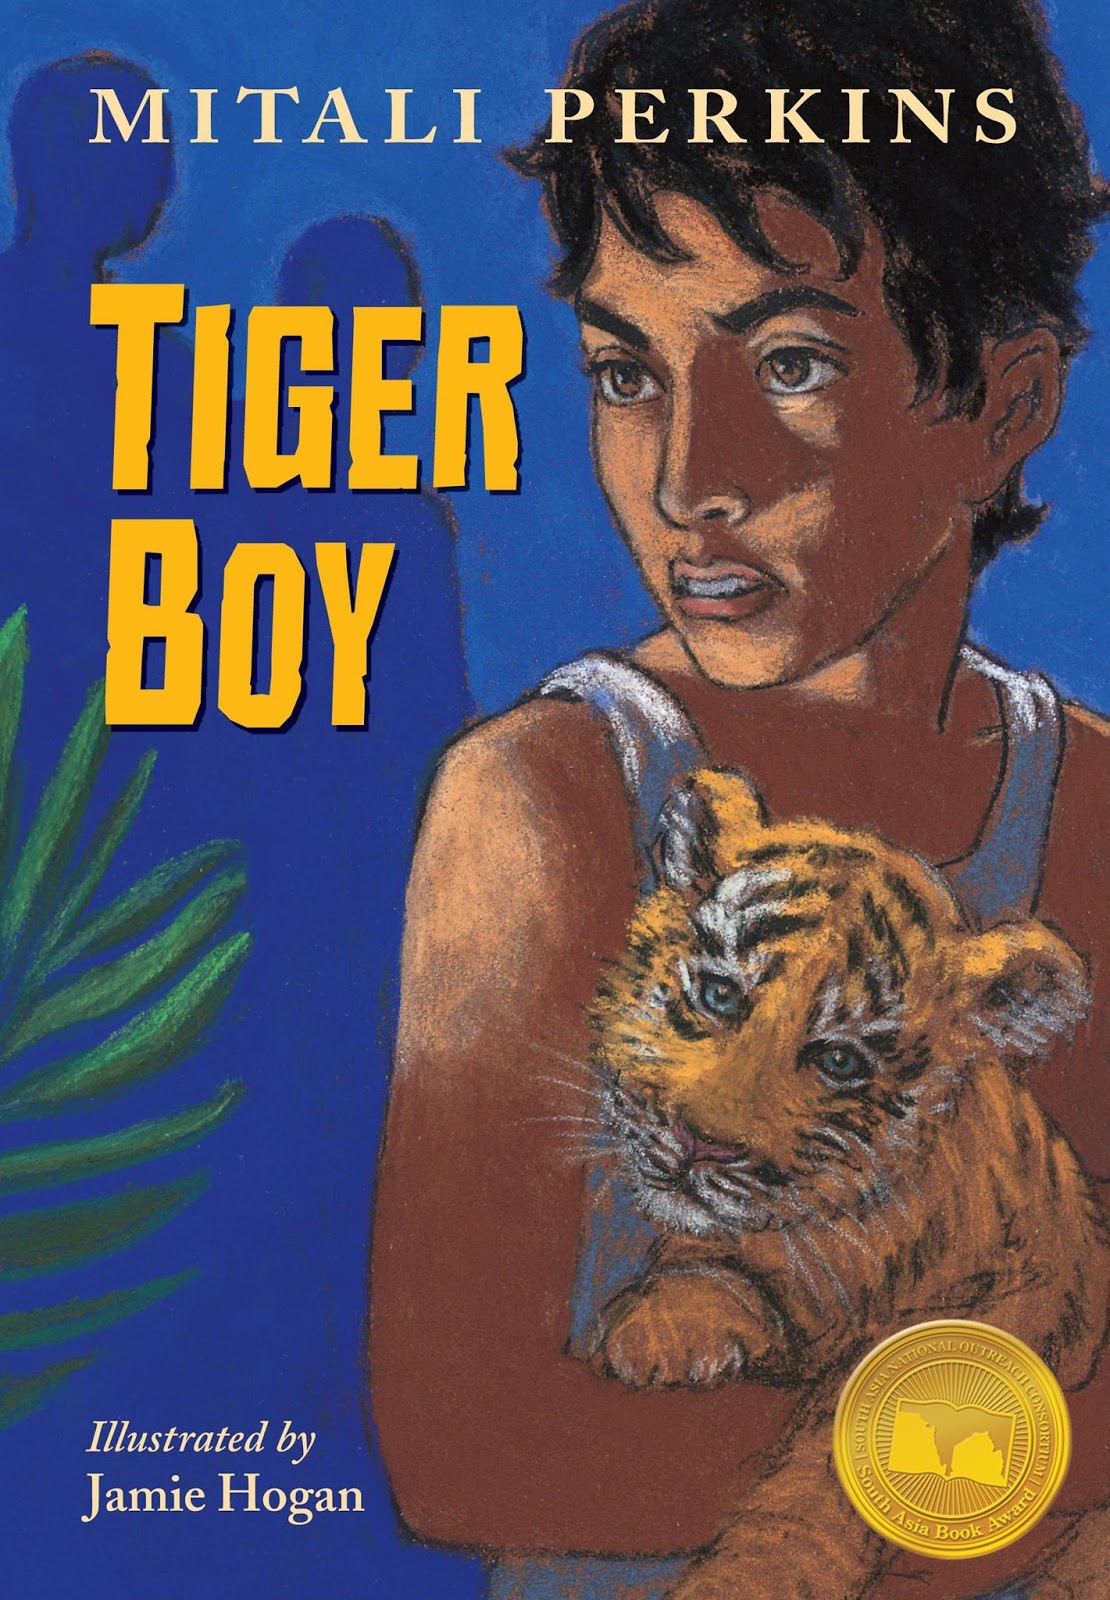 tiger boy by mitali perkins. Black Bedroom Furniture Sets. Home Design Ideas